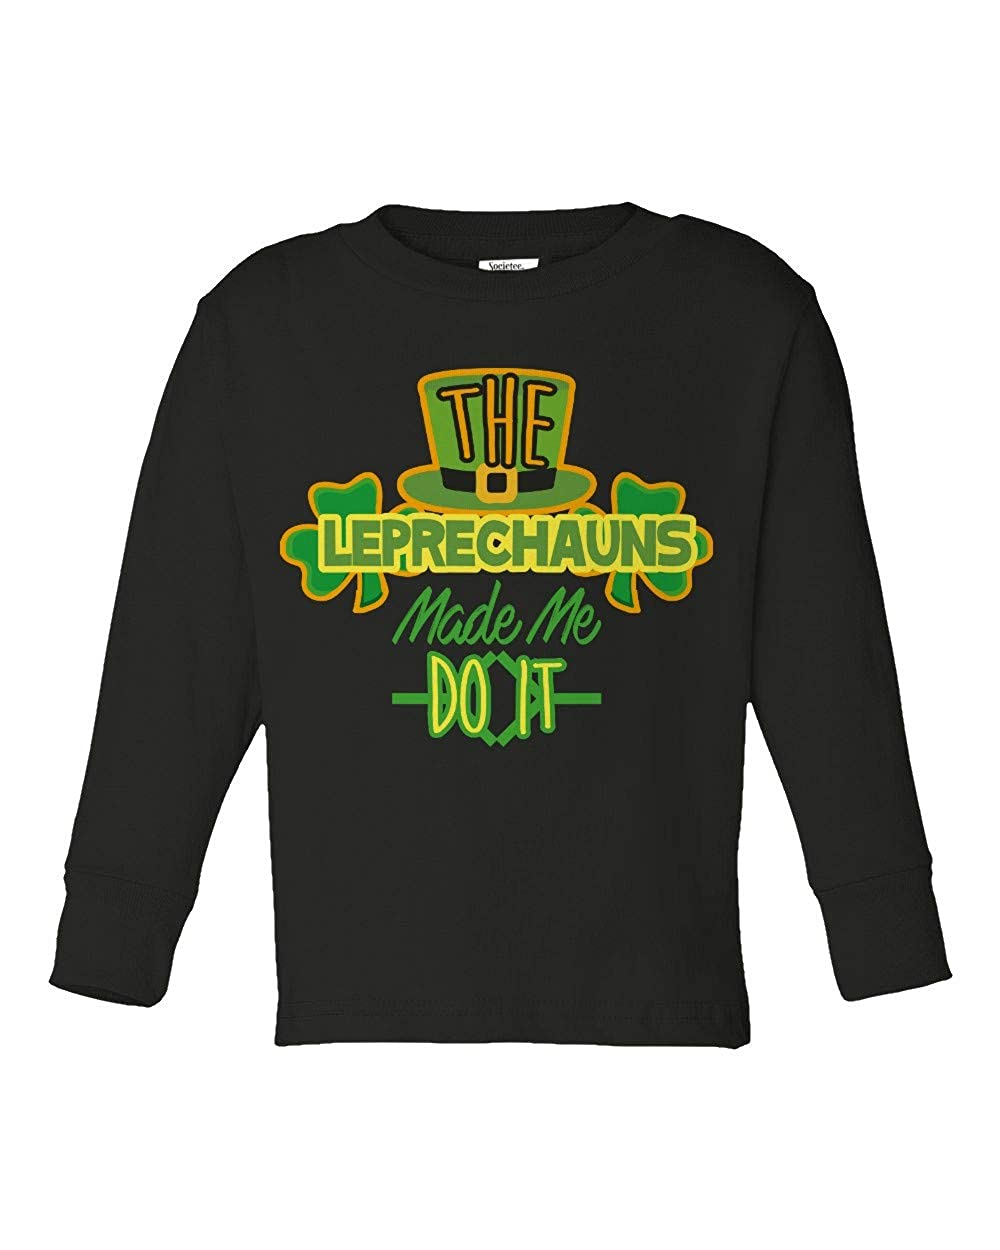 Societee Leprechauns Made Me Do It Cute Girls Boys Toddler Long Sleeve T-Shirt